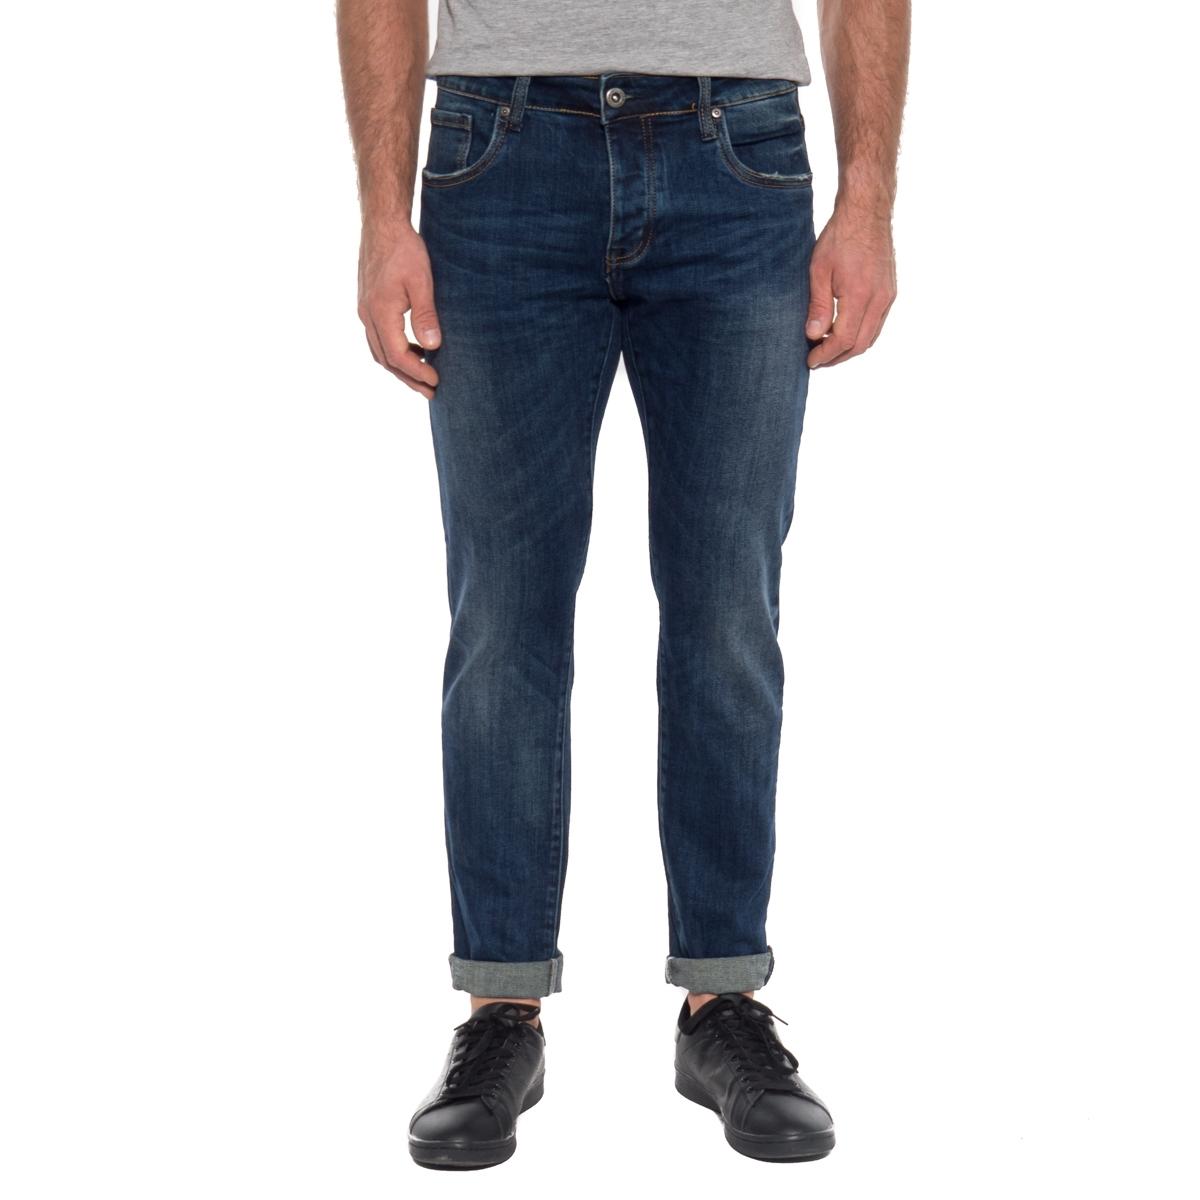 Jeans ARTY1006 da uomo by YELL!